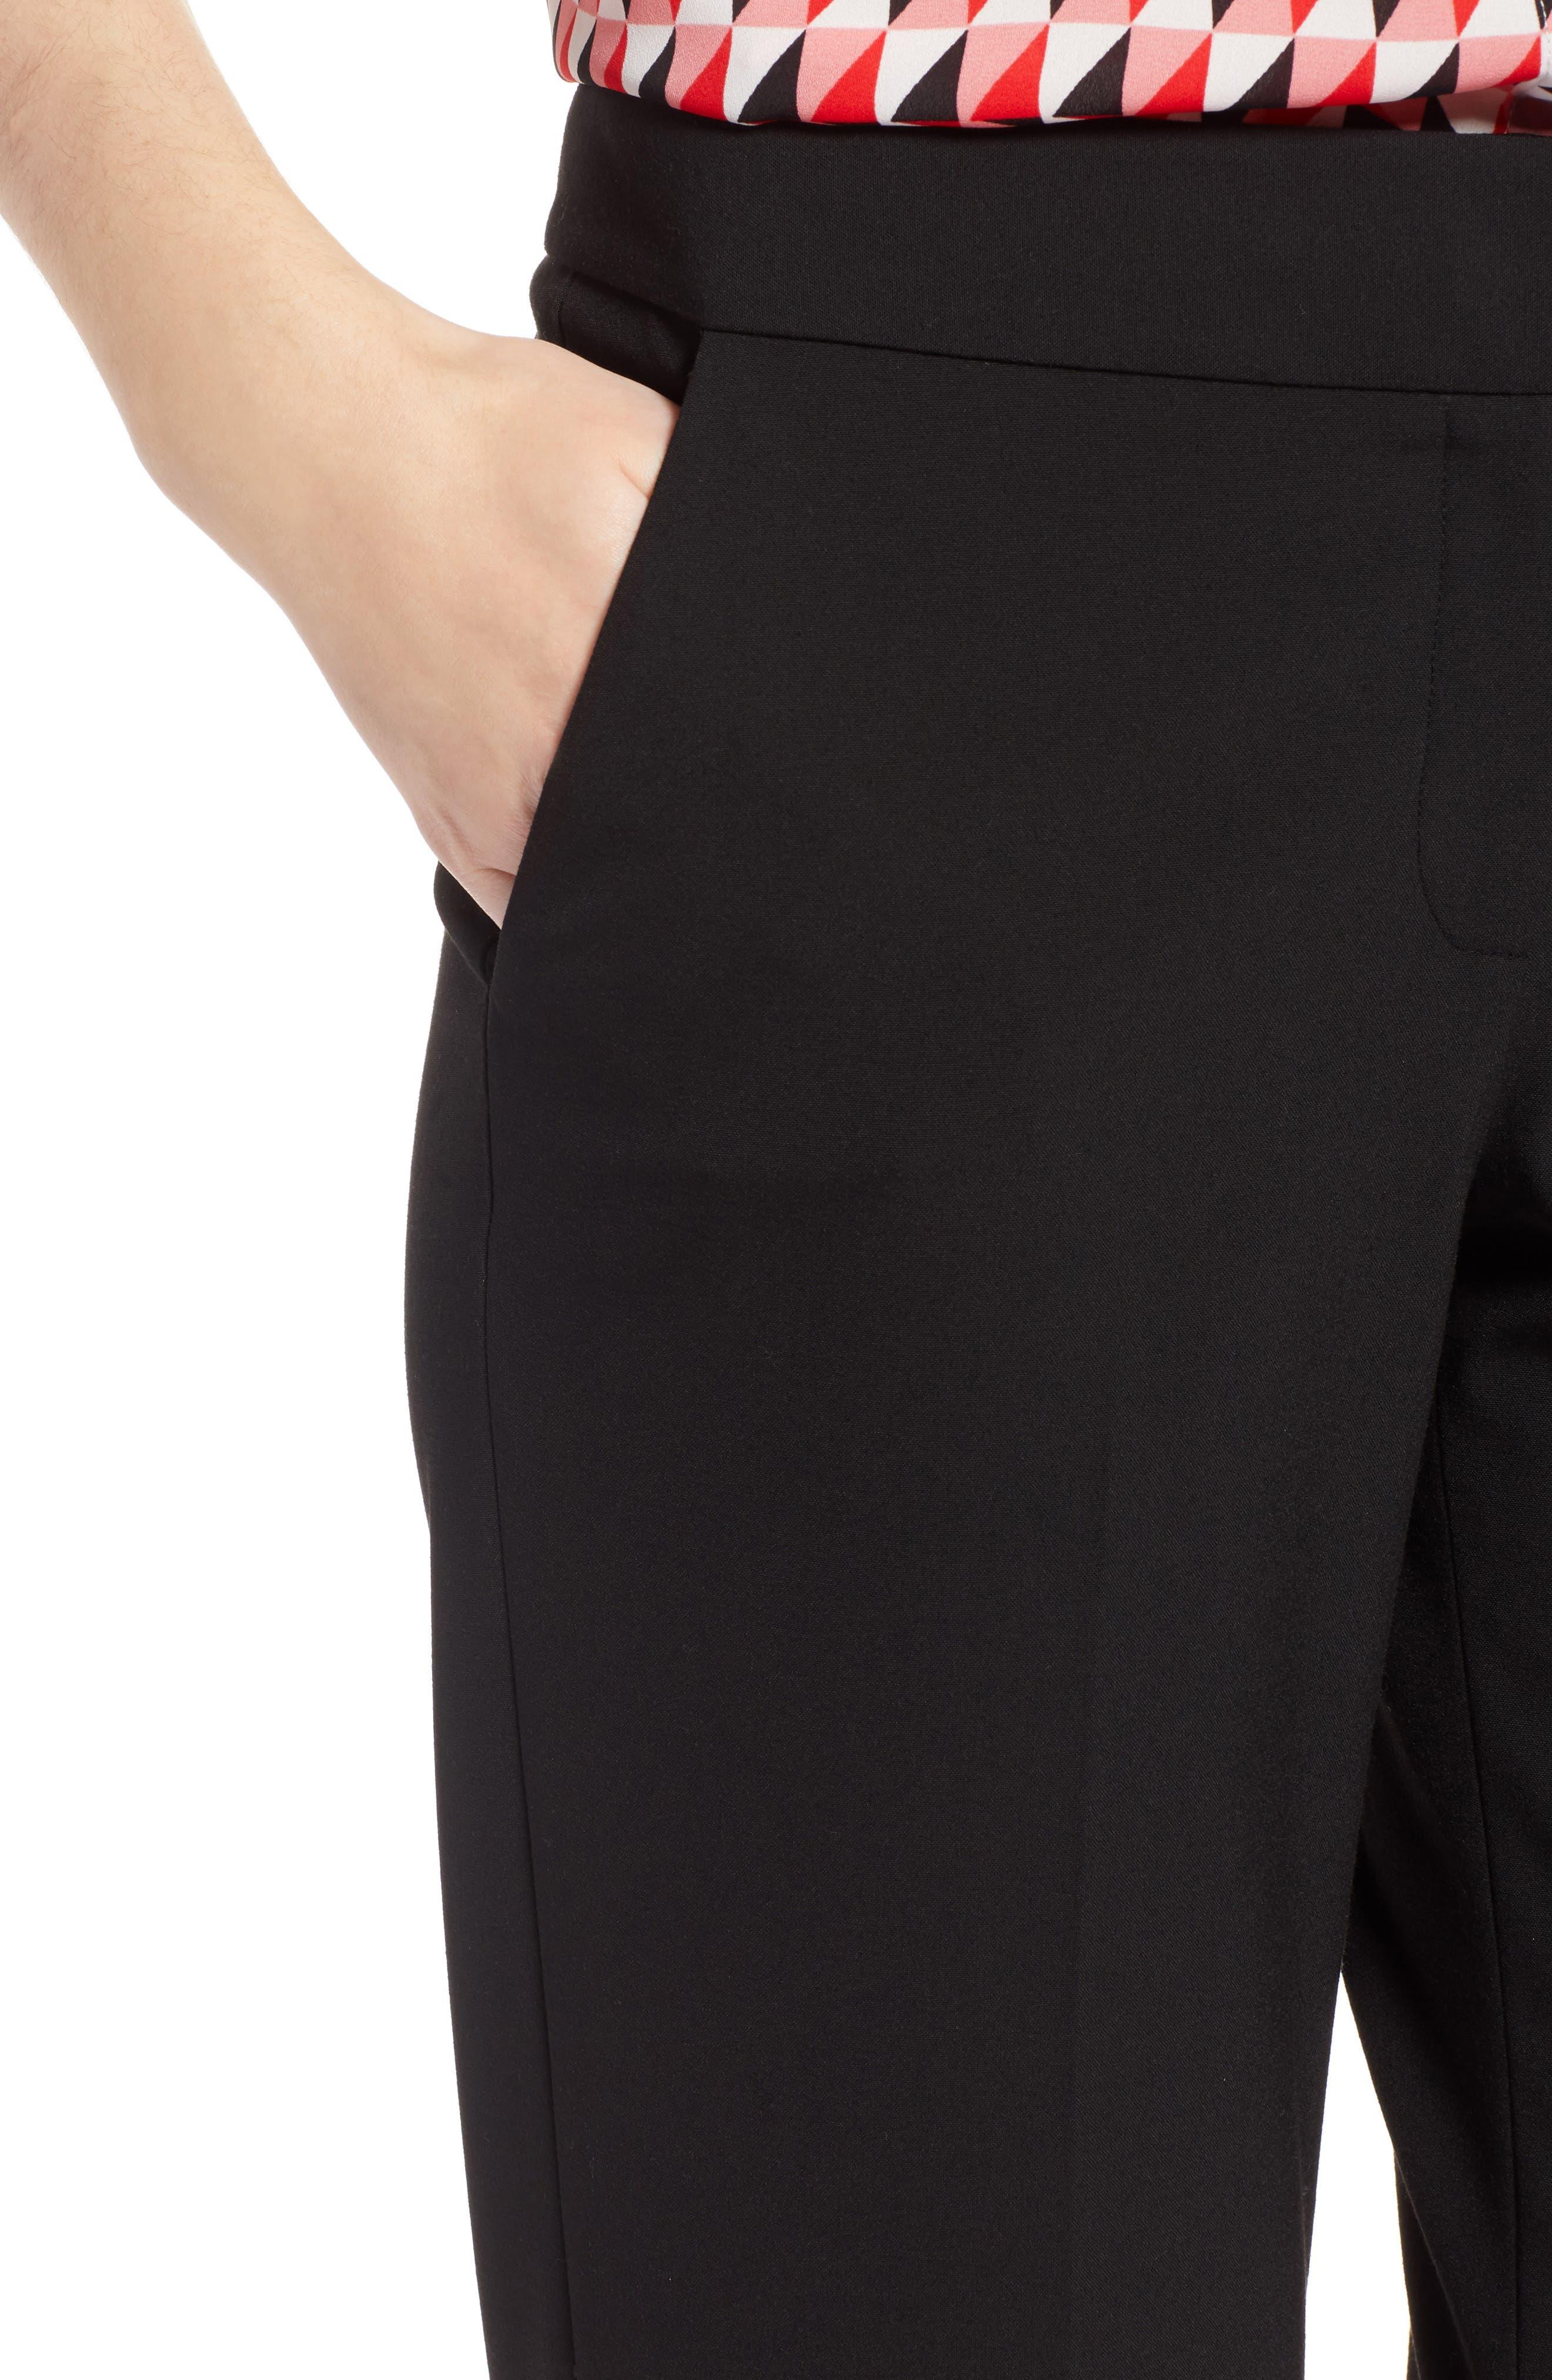 Stovepipe Pants,                             Alternate thumbnail 4, color,                             Black